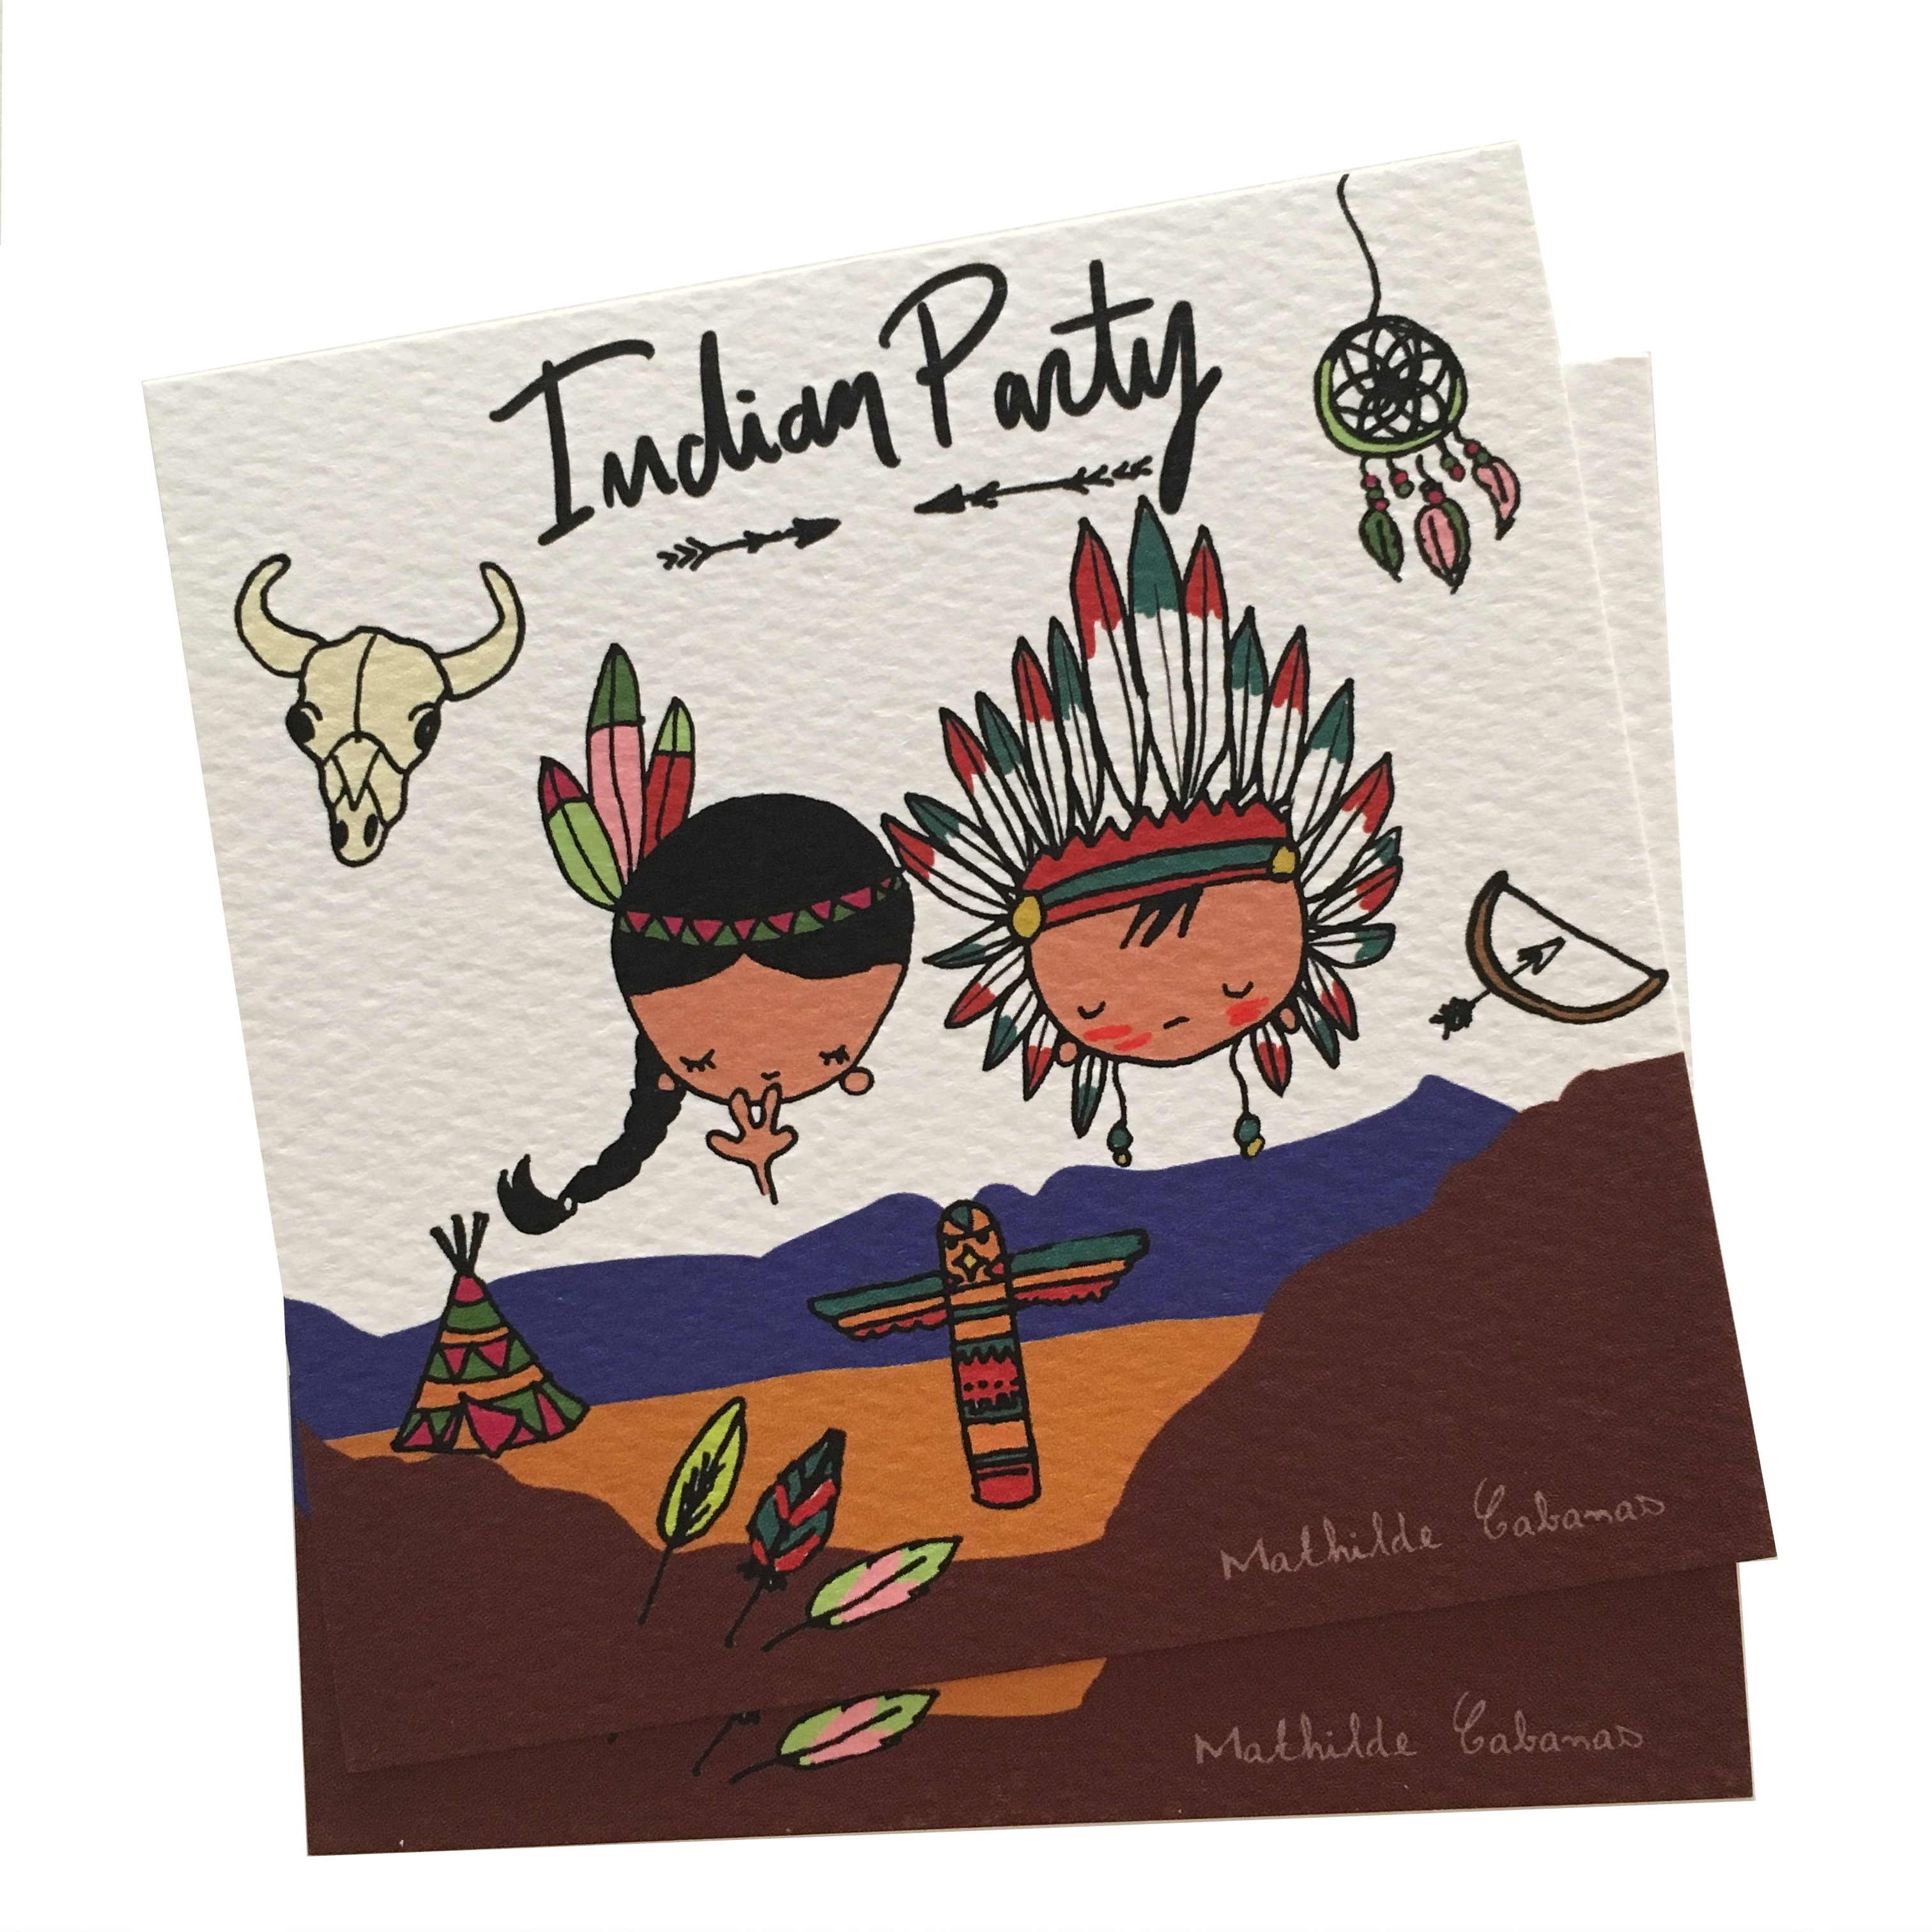 Invitation Anniversaire Indiens X 6 Mathilde Cabanas Papeterie